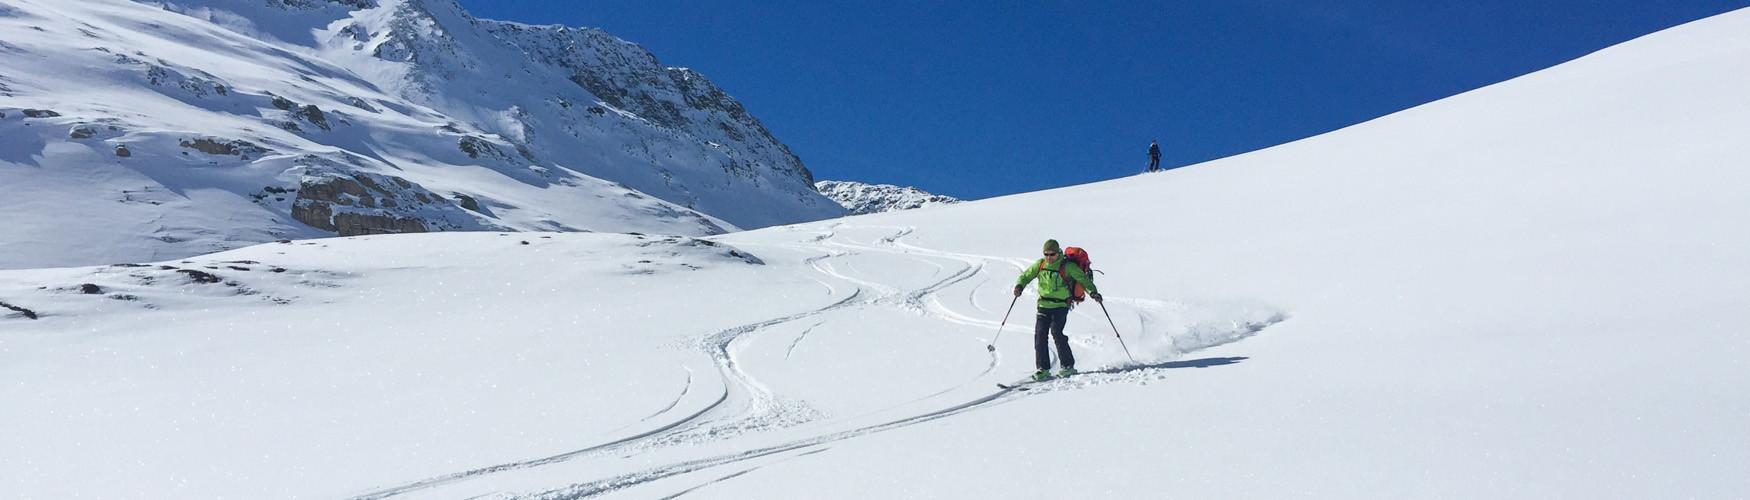 Skitouren Saoseo, Bernina Skitour, Bergführer Bernina